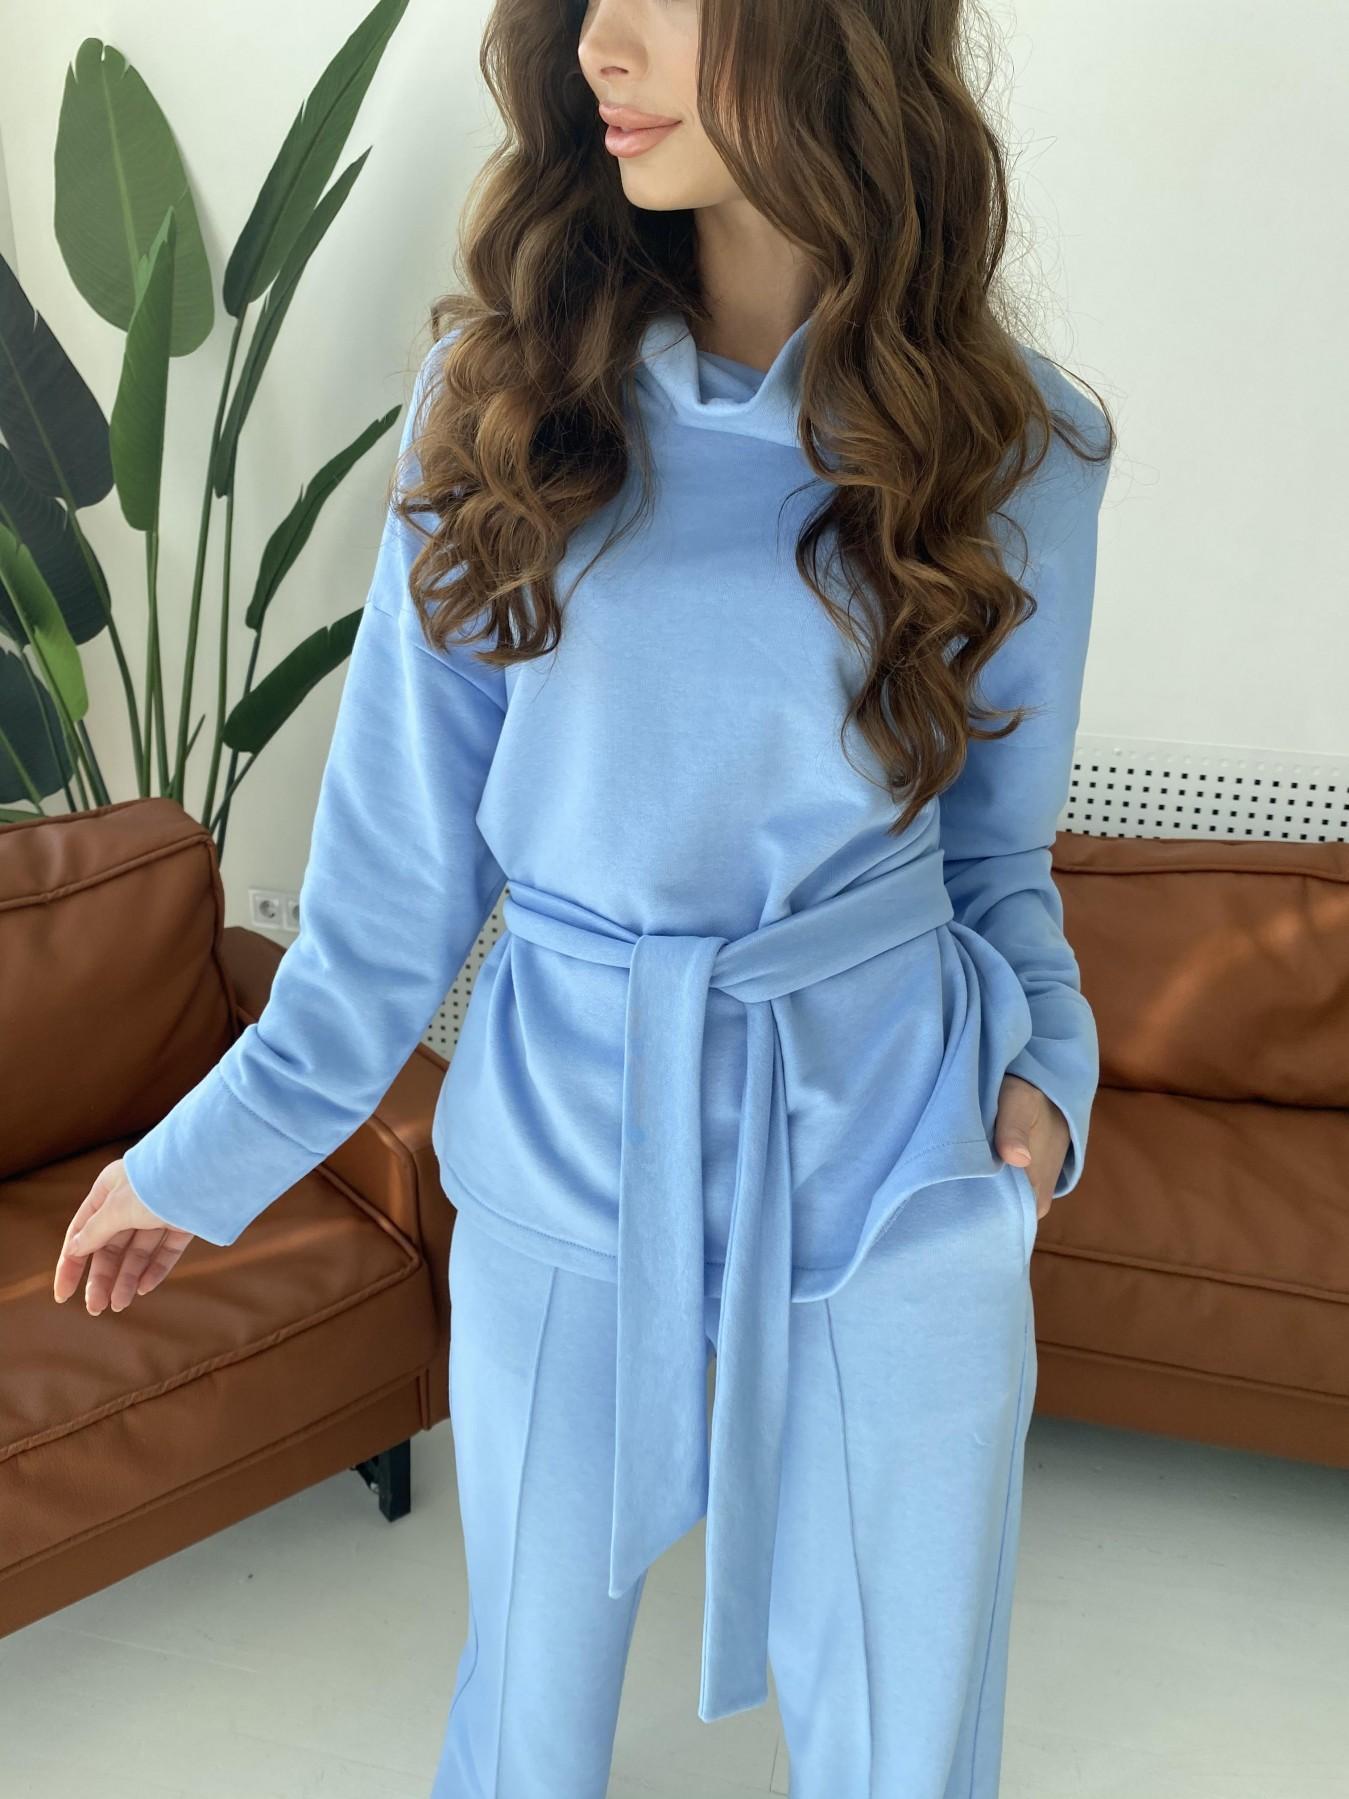 Джаст костюм Oversize  3х нитка 10564 АРТ. 47245 Цвет: Голубой - фото 3, интернет магазин tm-modus.ru